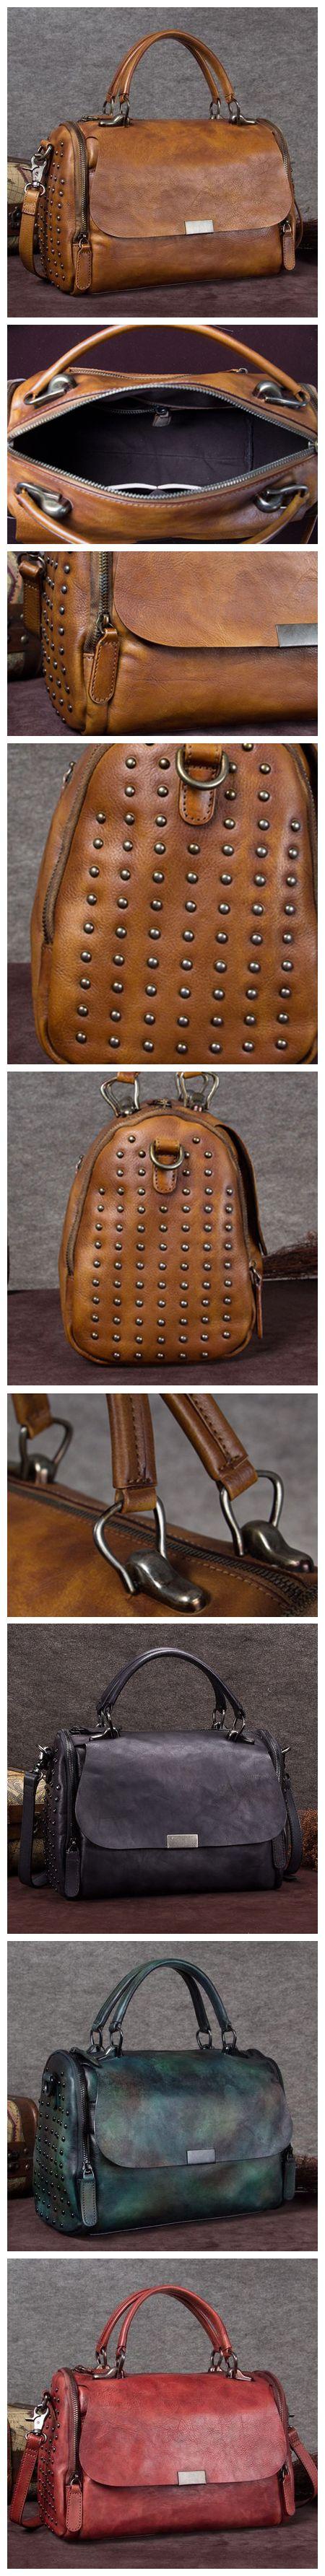 Handmade Duffle Bag, Travel Bag, Ladies Handbag, Overnight Bag A0138